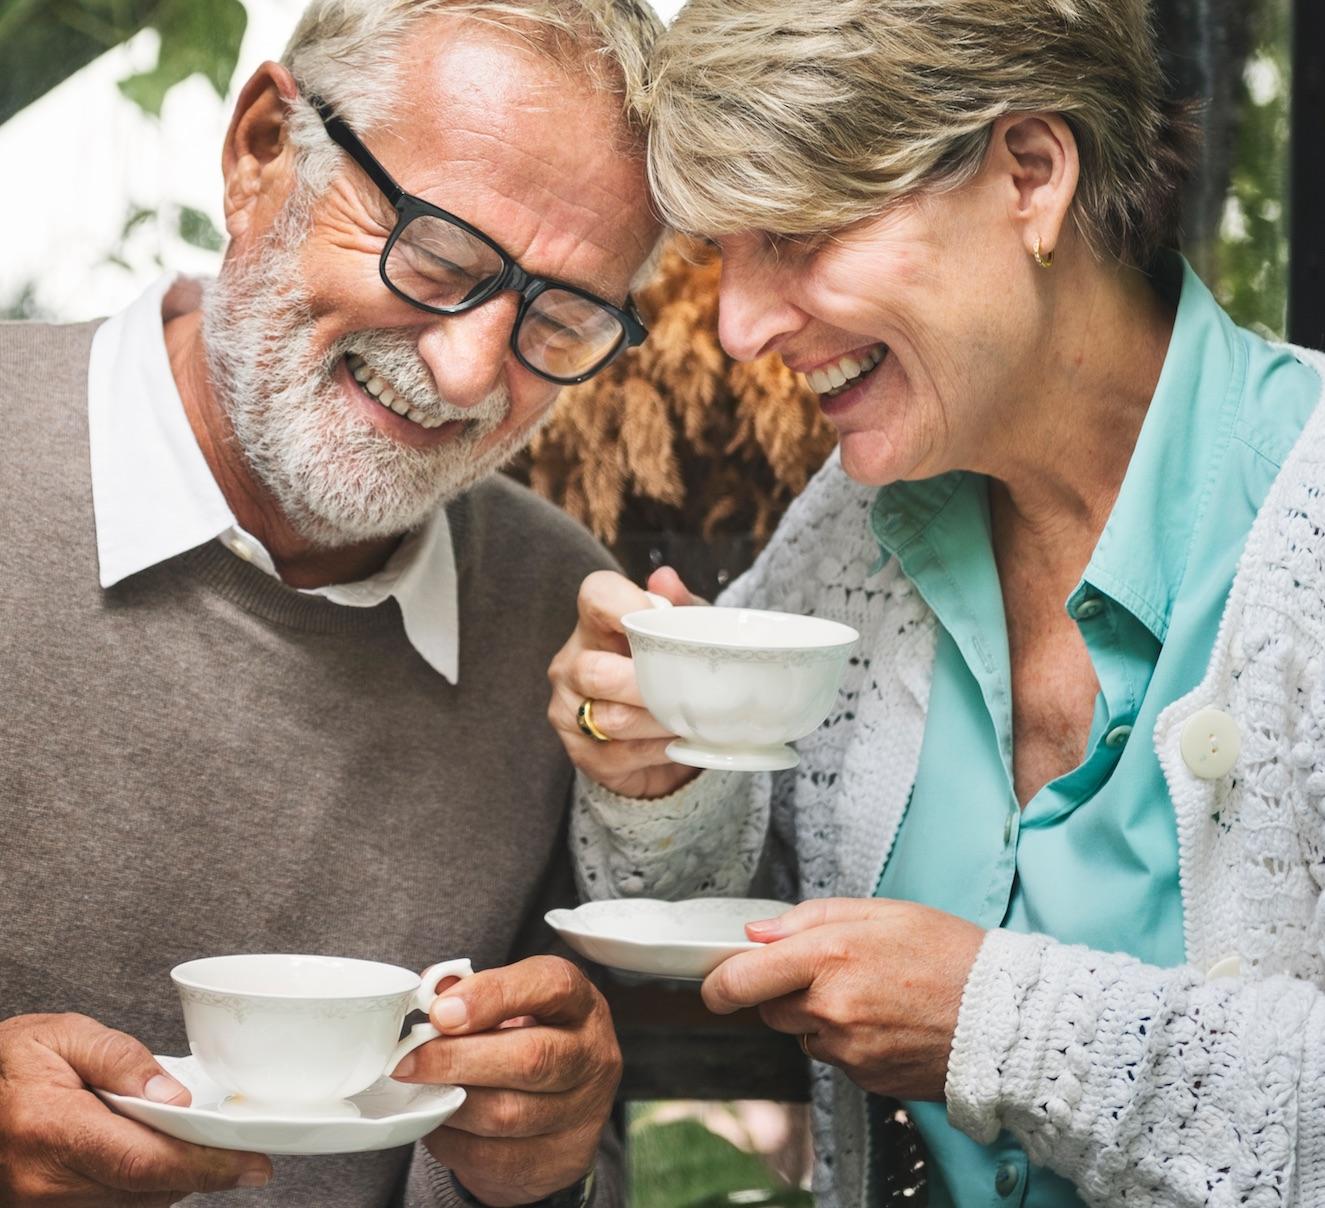 Senior-Couple-Afternoon-Tea-Drinking-Relax-Concept-635965198_4396x2931_jpeg.jpg